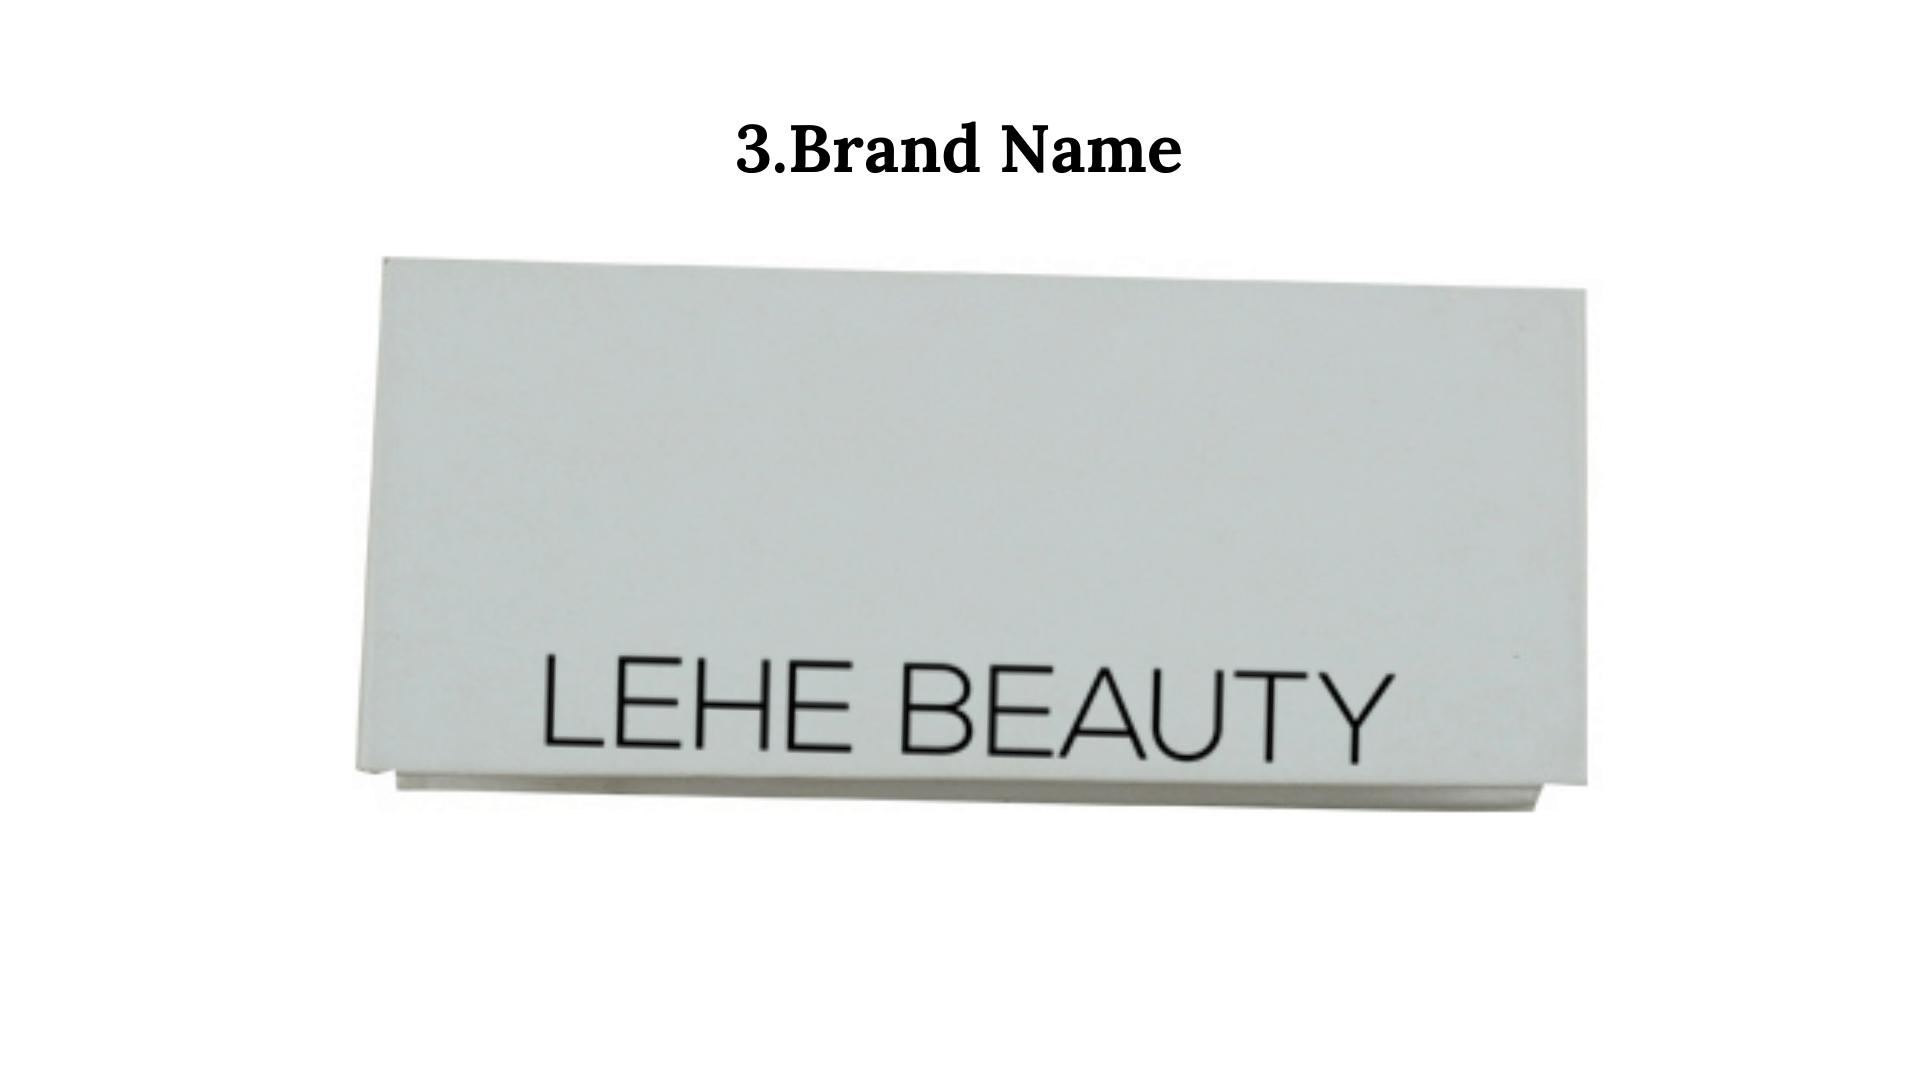 lashes brand name